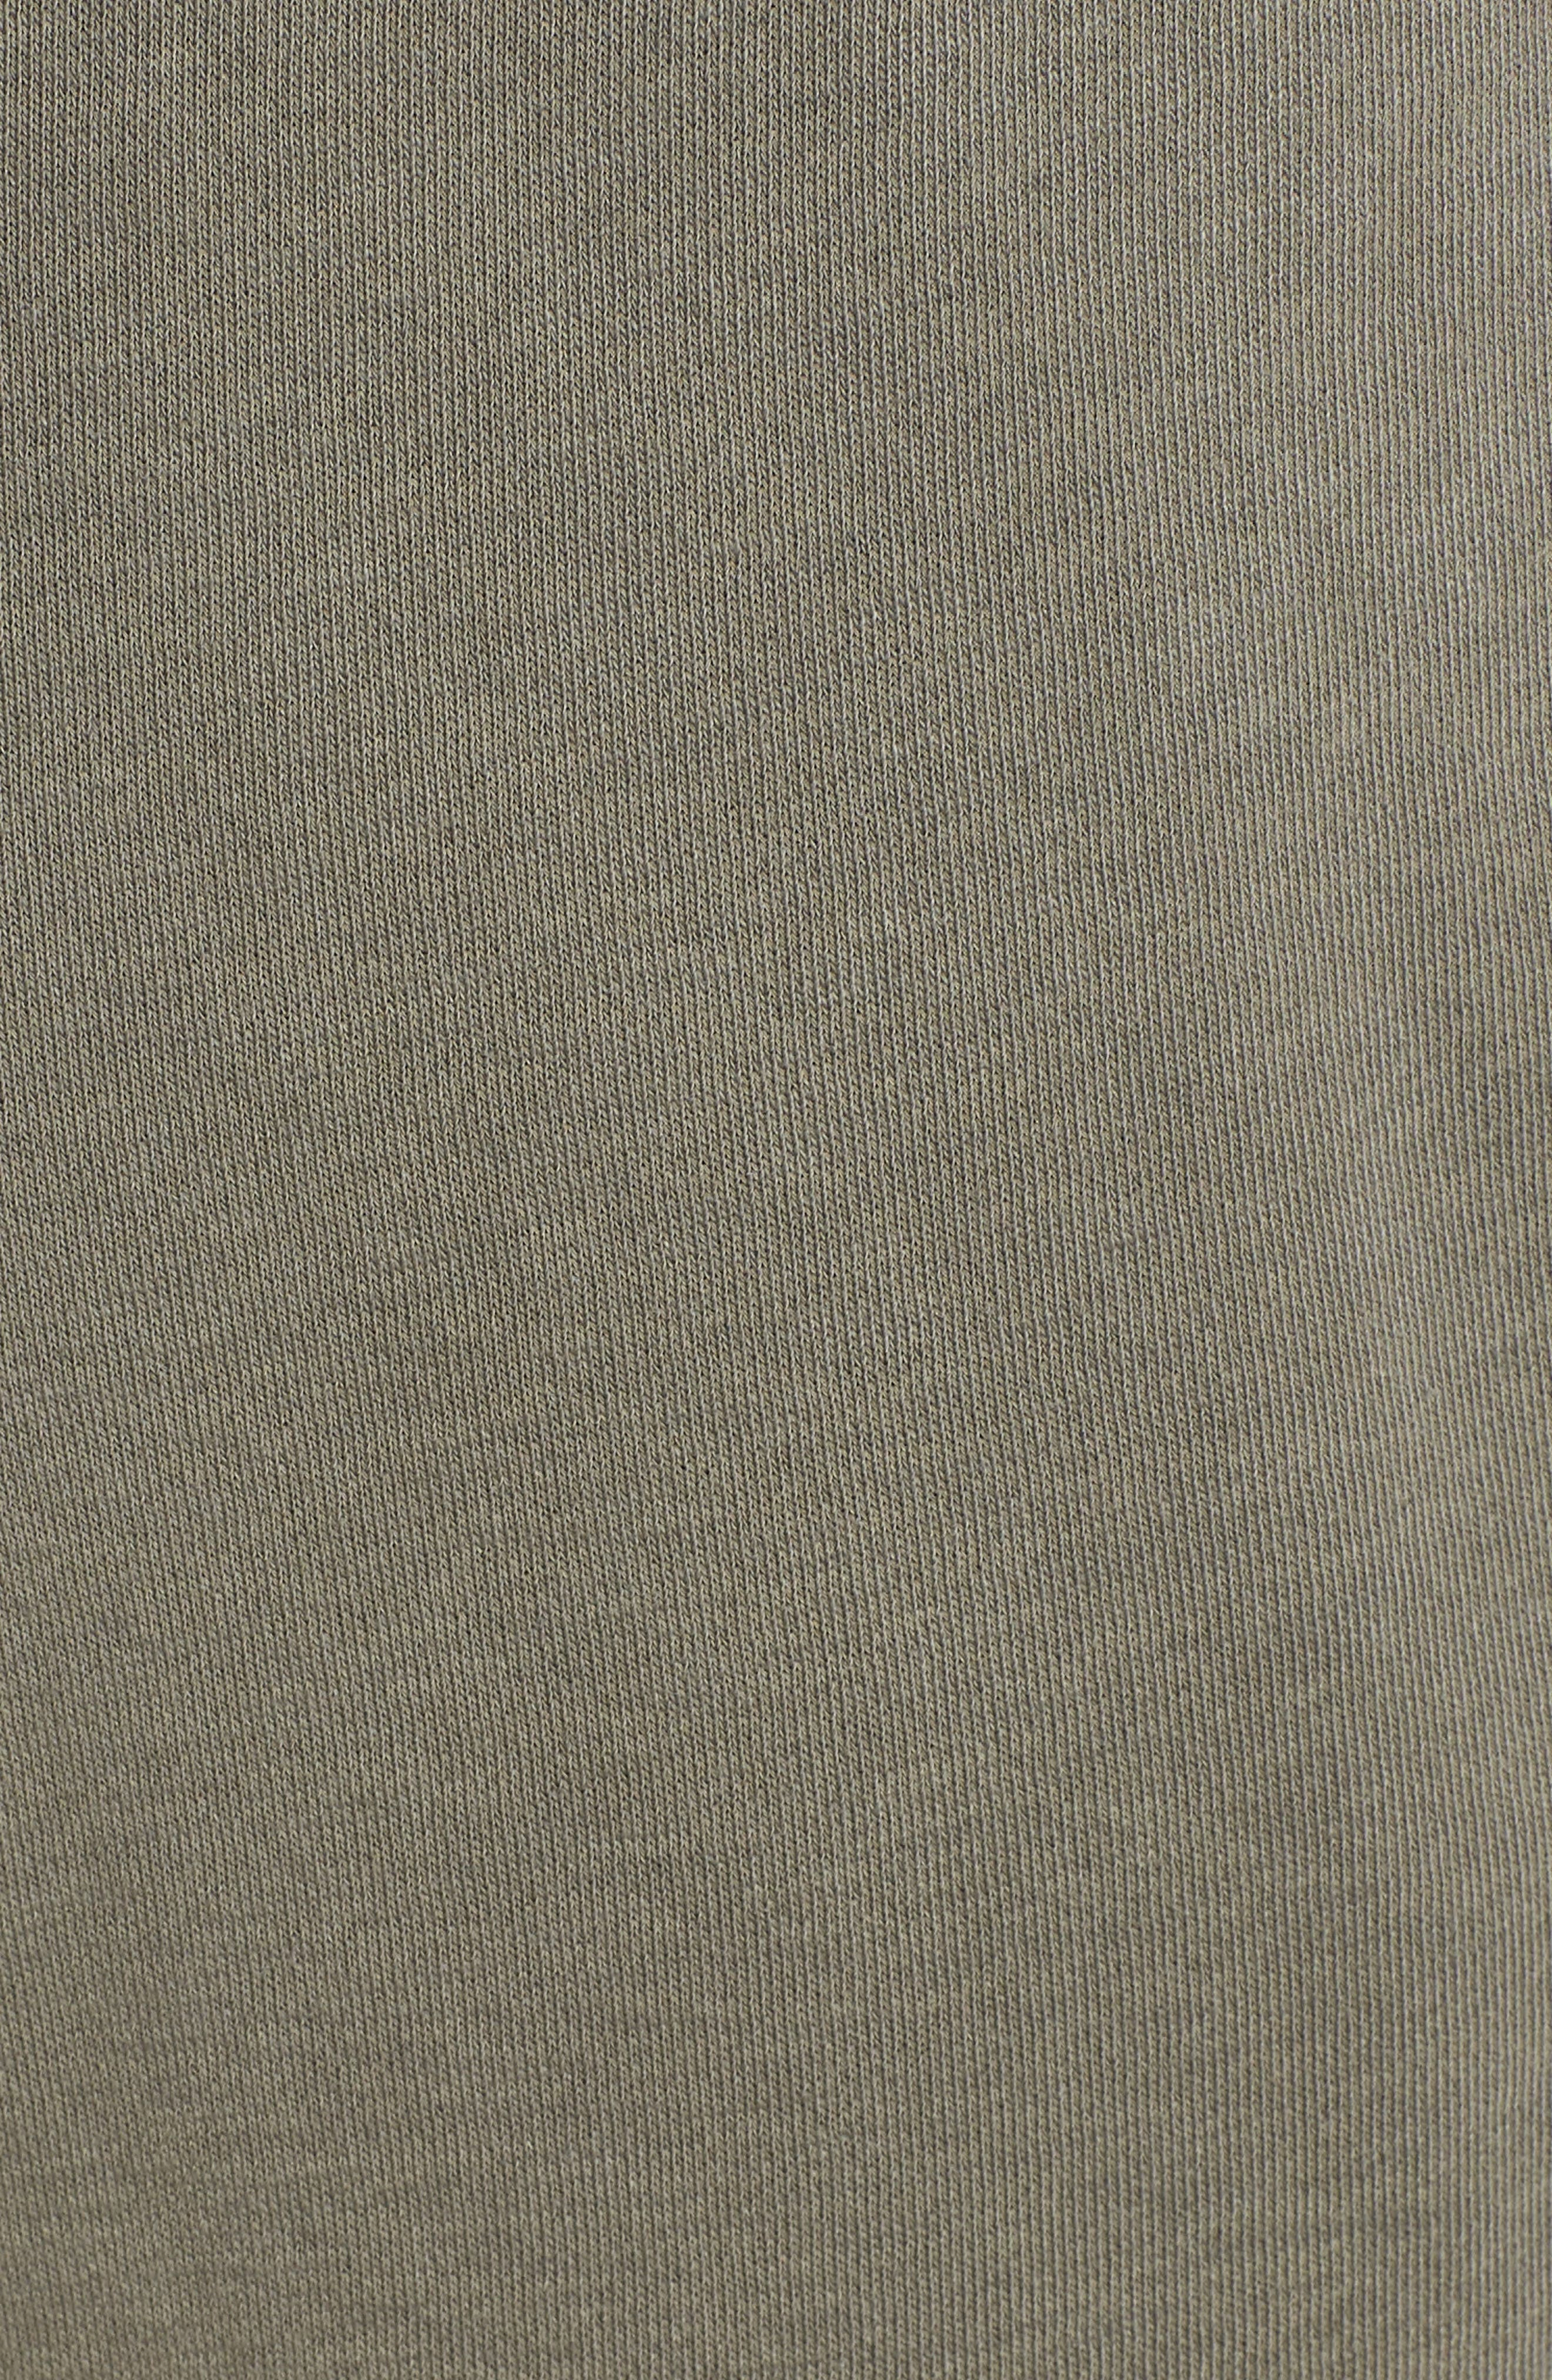 'Classic' Sweatpants,                             Alternate thumbnail 39, color,